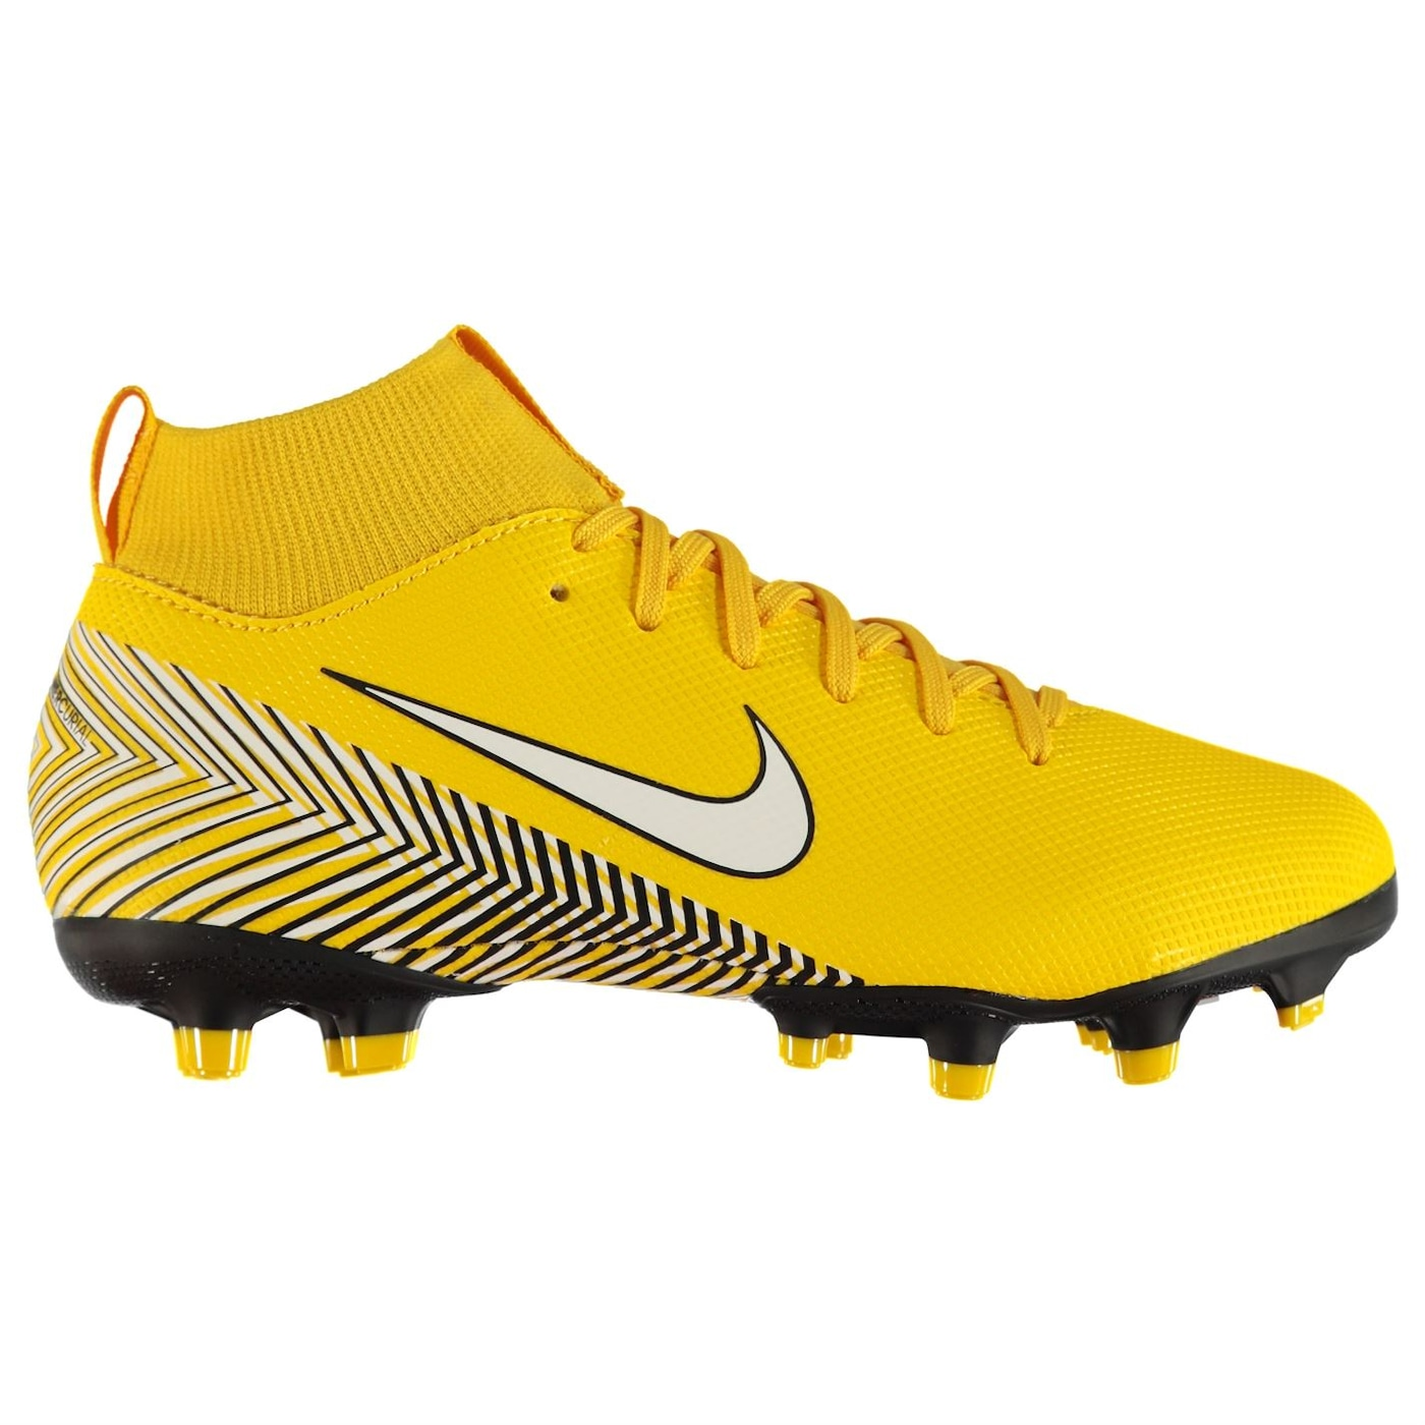 Nike Mercurial Superfly Academy Neymar Jr DF Junior FG Football Boots